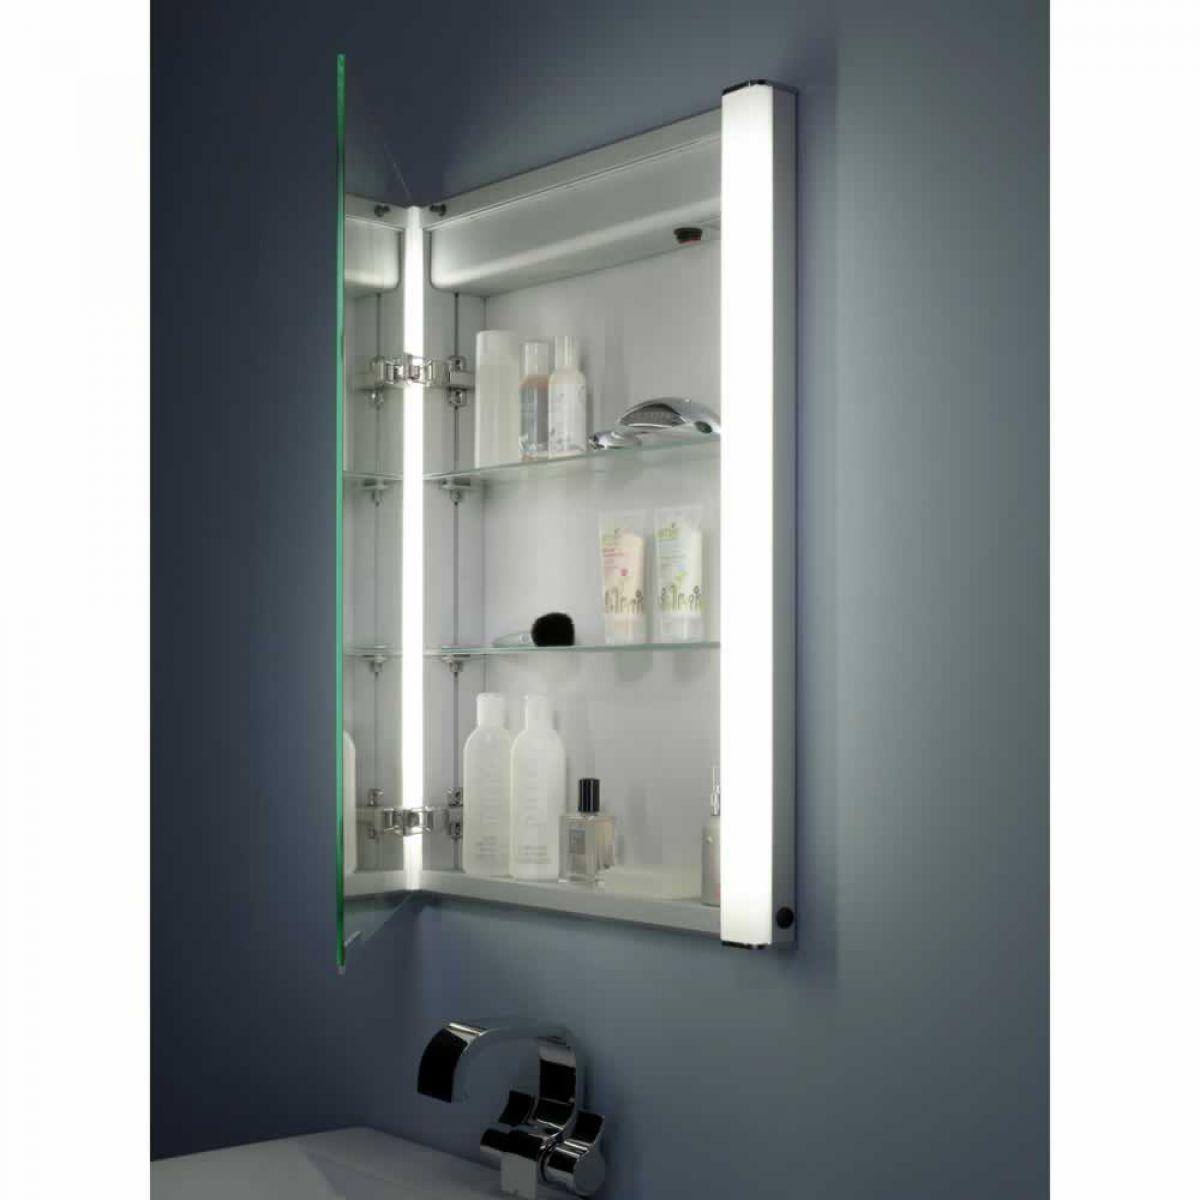 ascension illusion illuminated recessible cabinet uk bathrooms